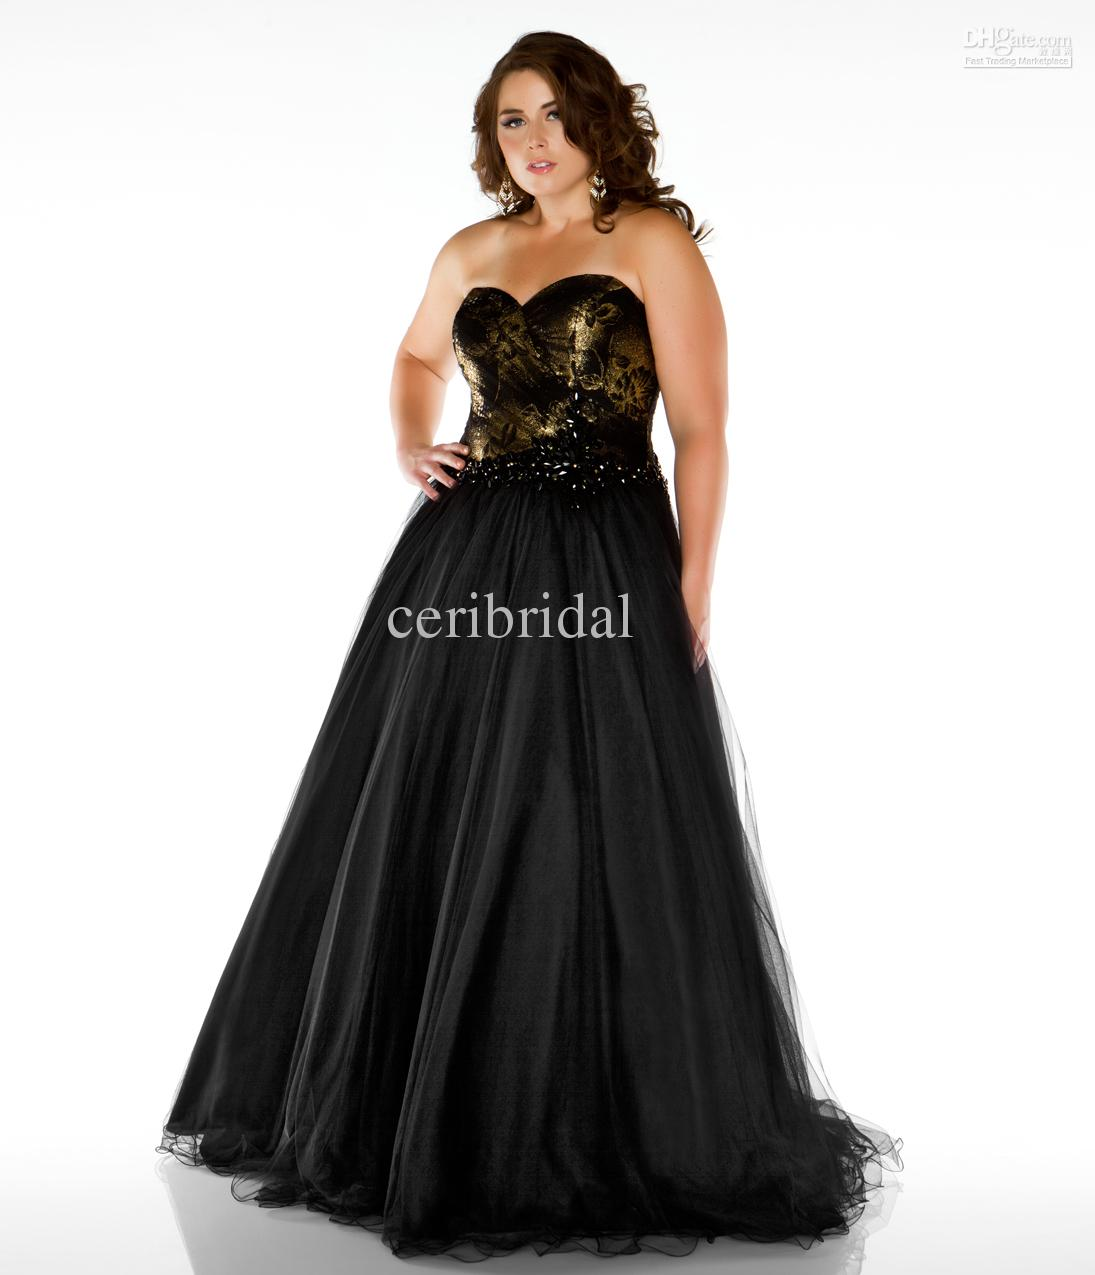 black and gold plus size prom dresses | good dresses